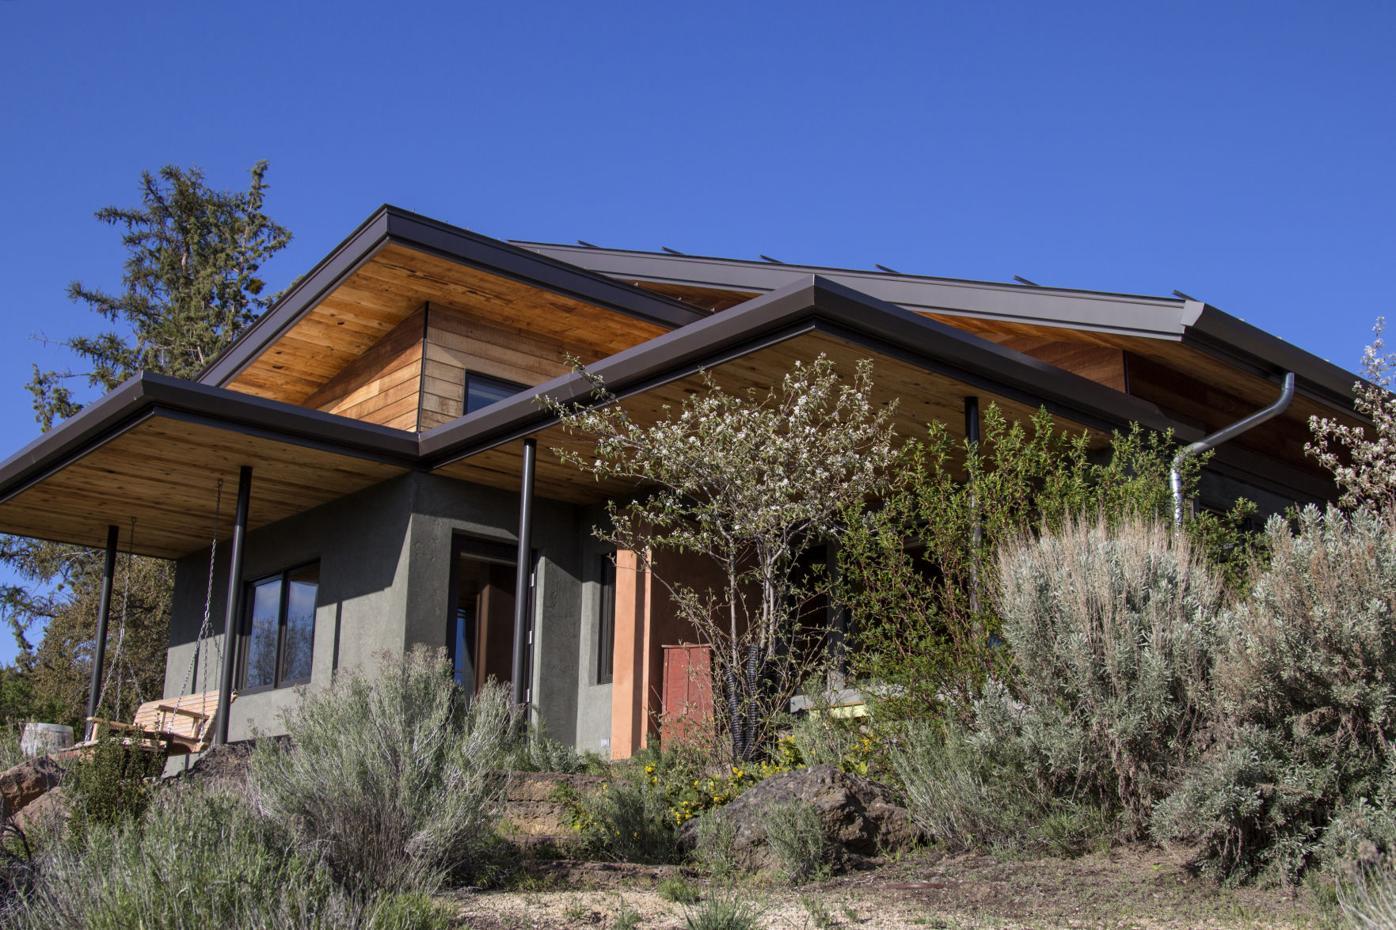 Desert Rain and the Living Building Challenge